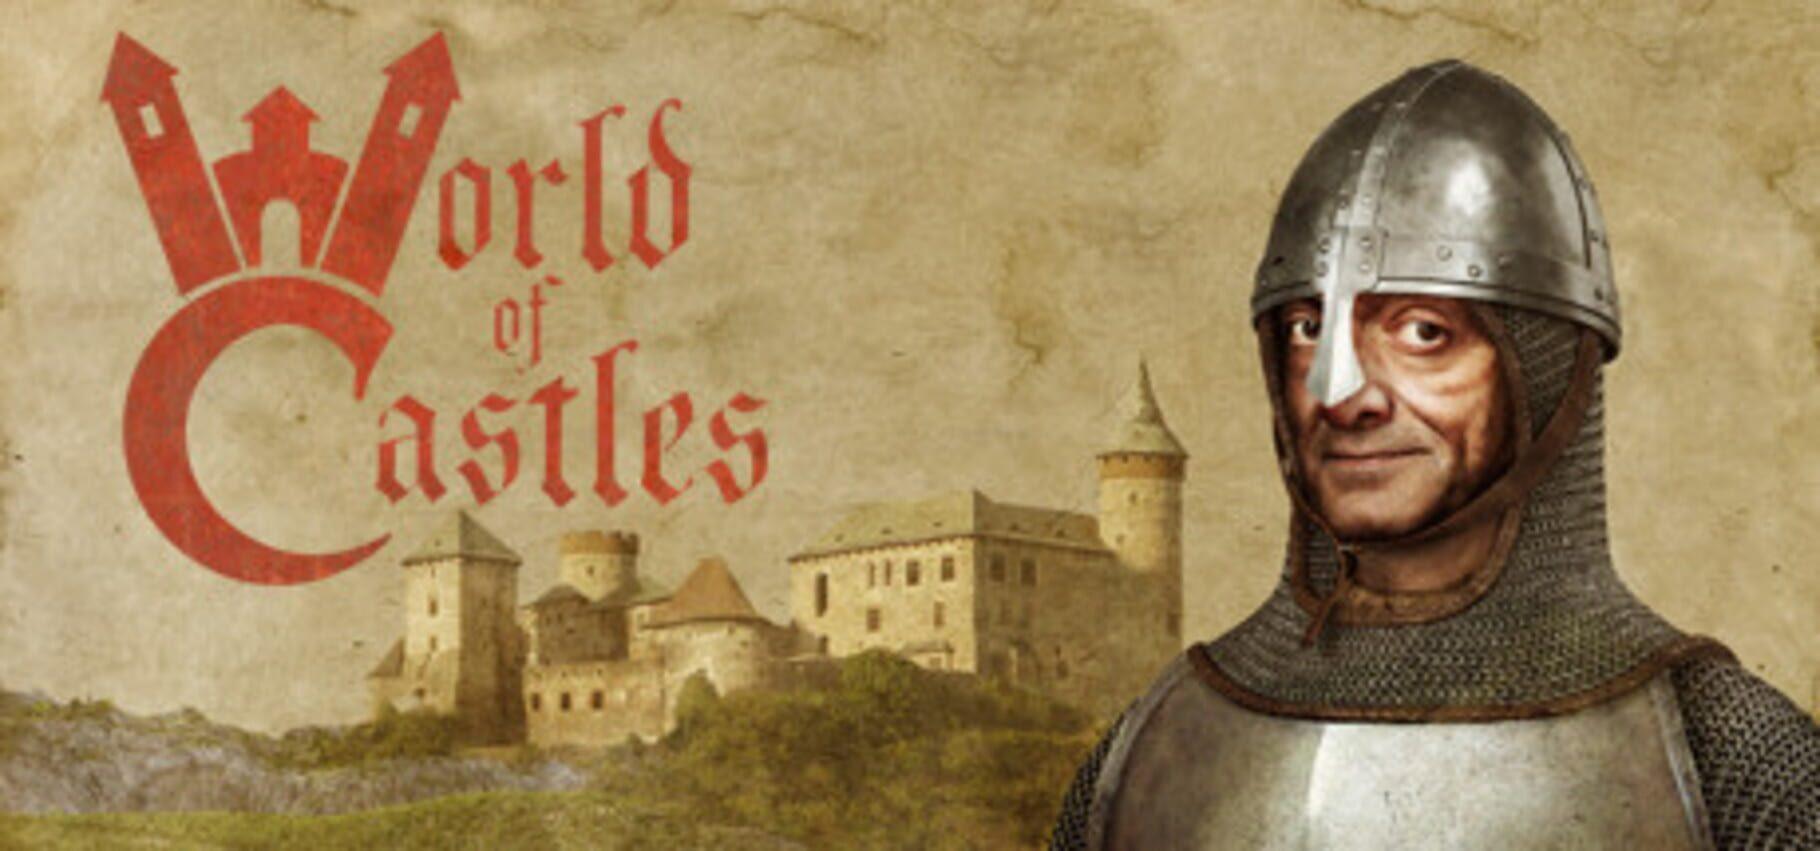 buy World of Castles cd key for all platform